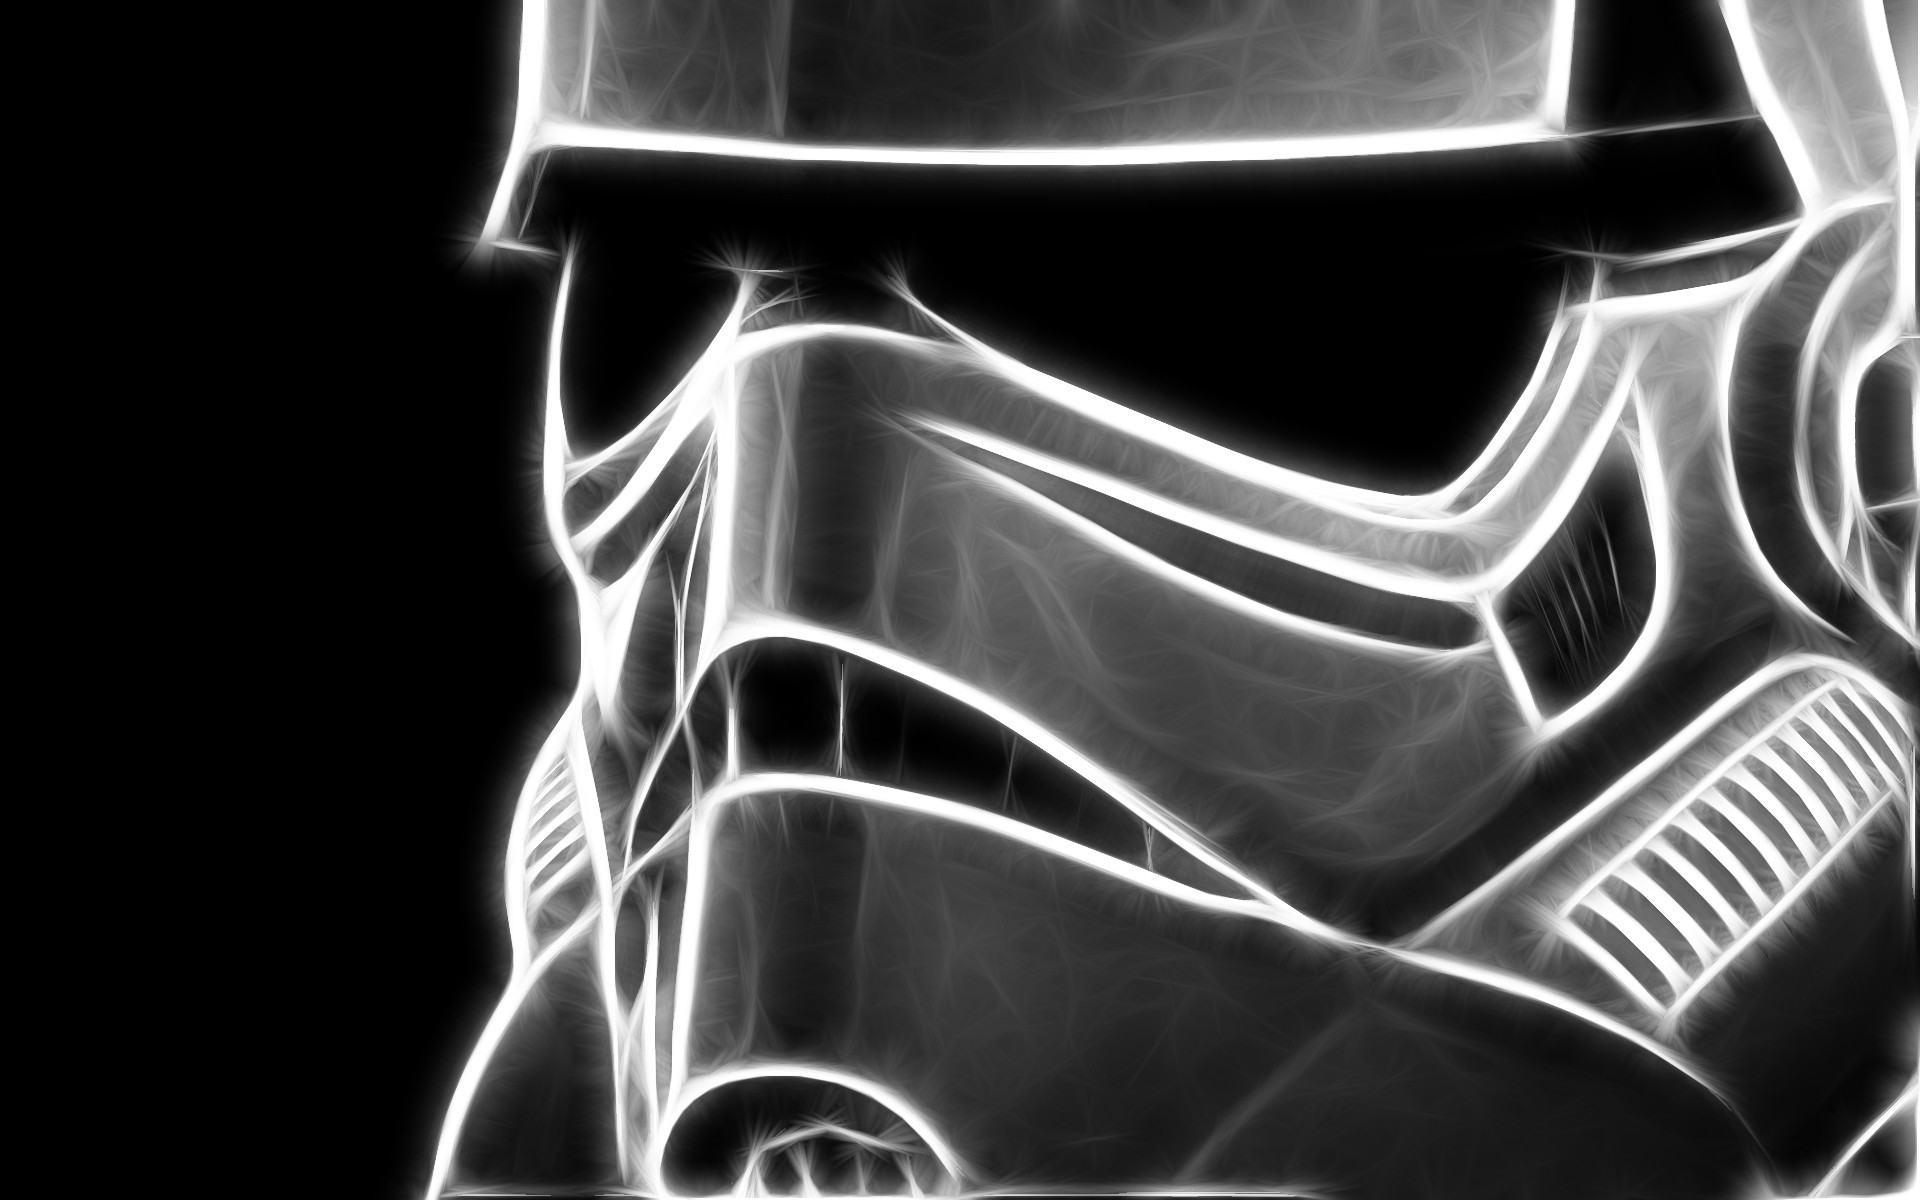 Star Wars Stormtrooper Wallpaper Hd , HD Wallpaper & Backgrounds